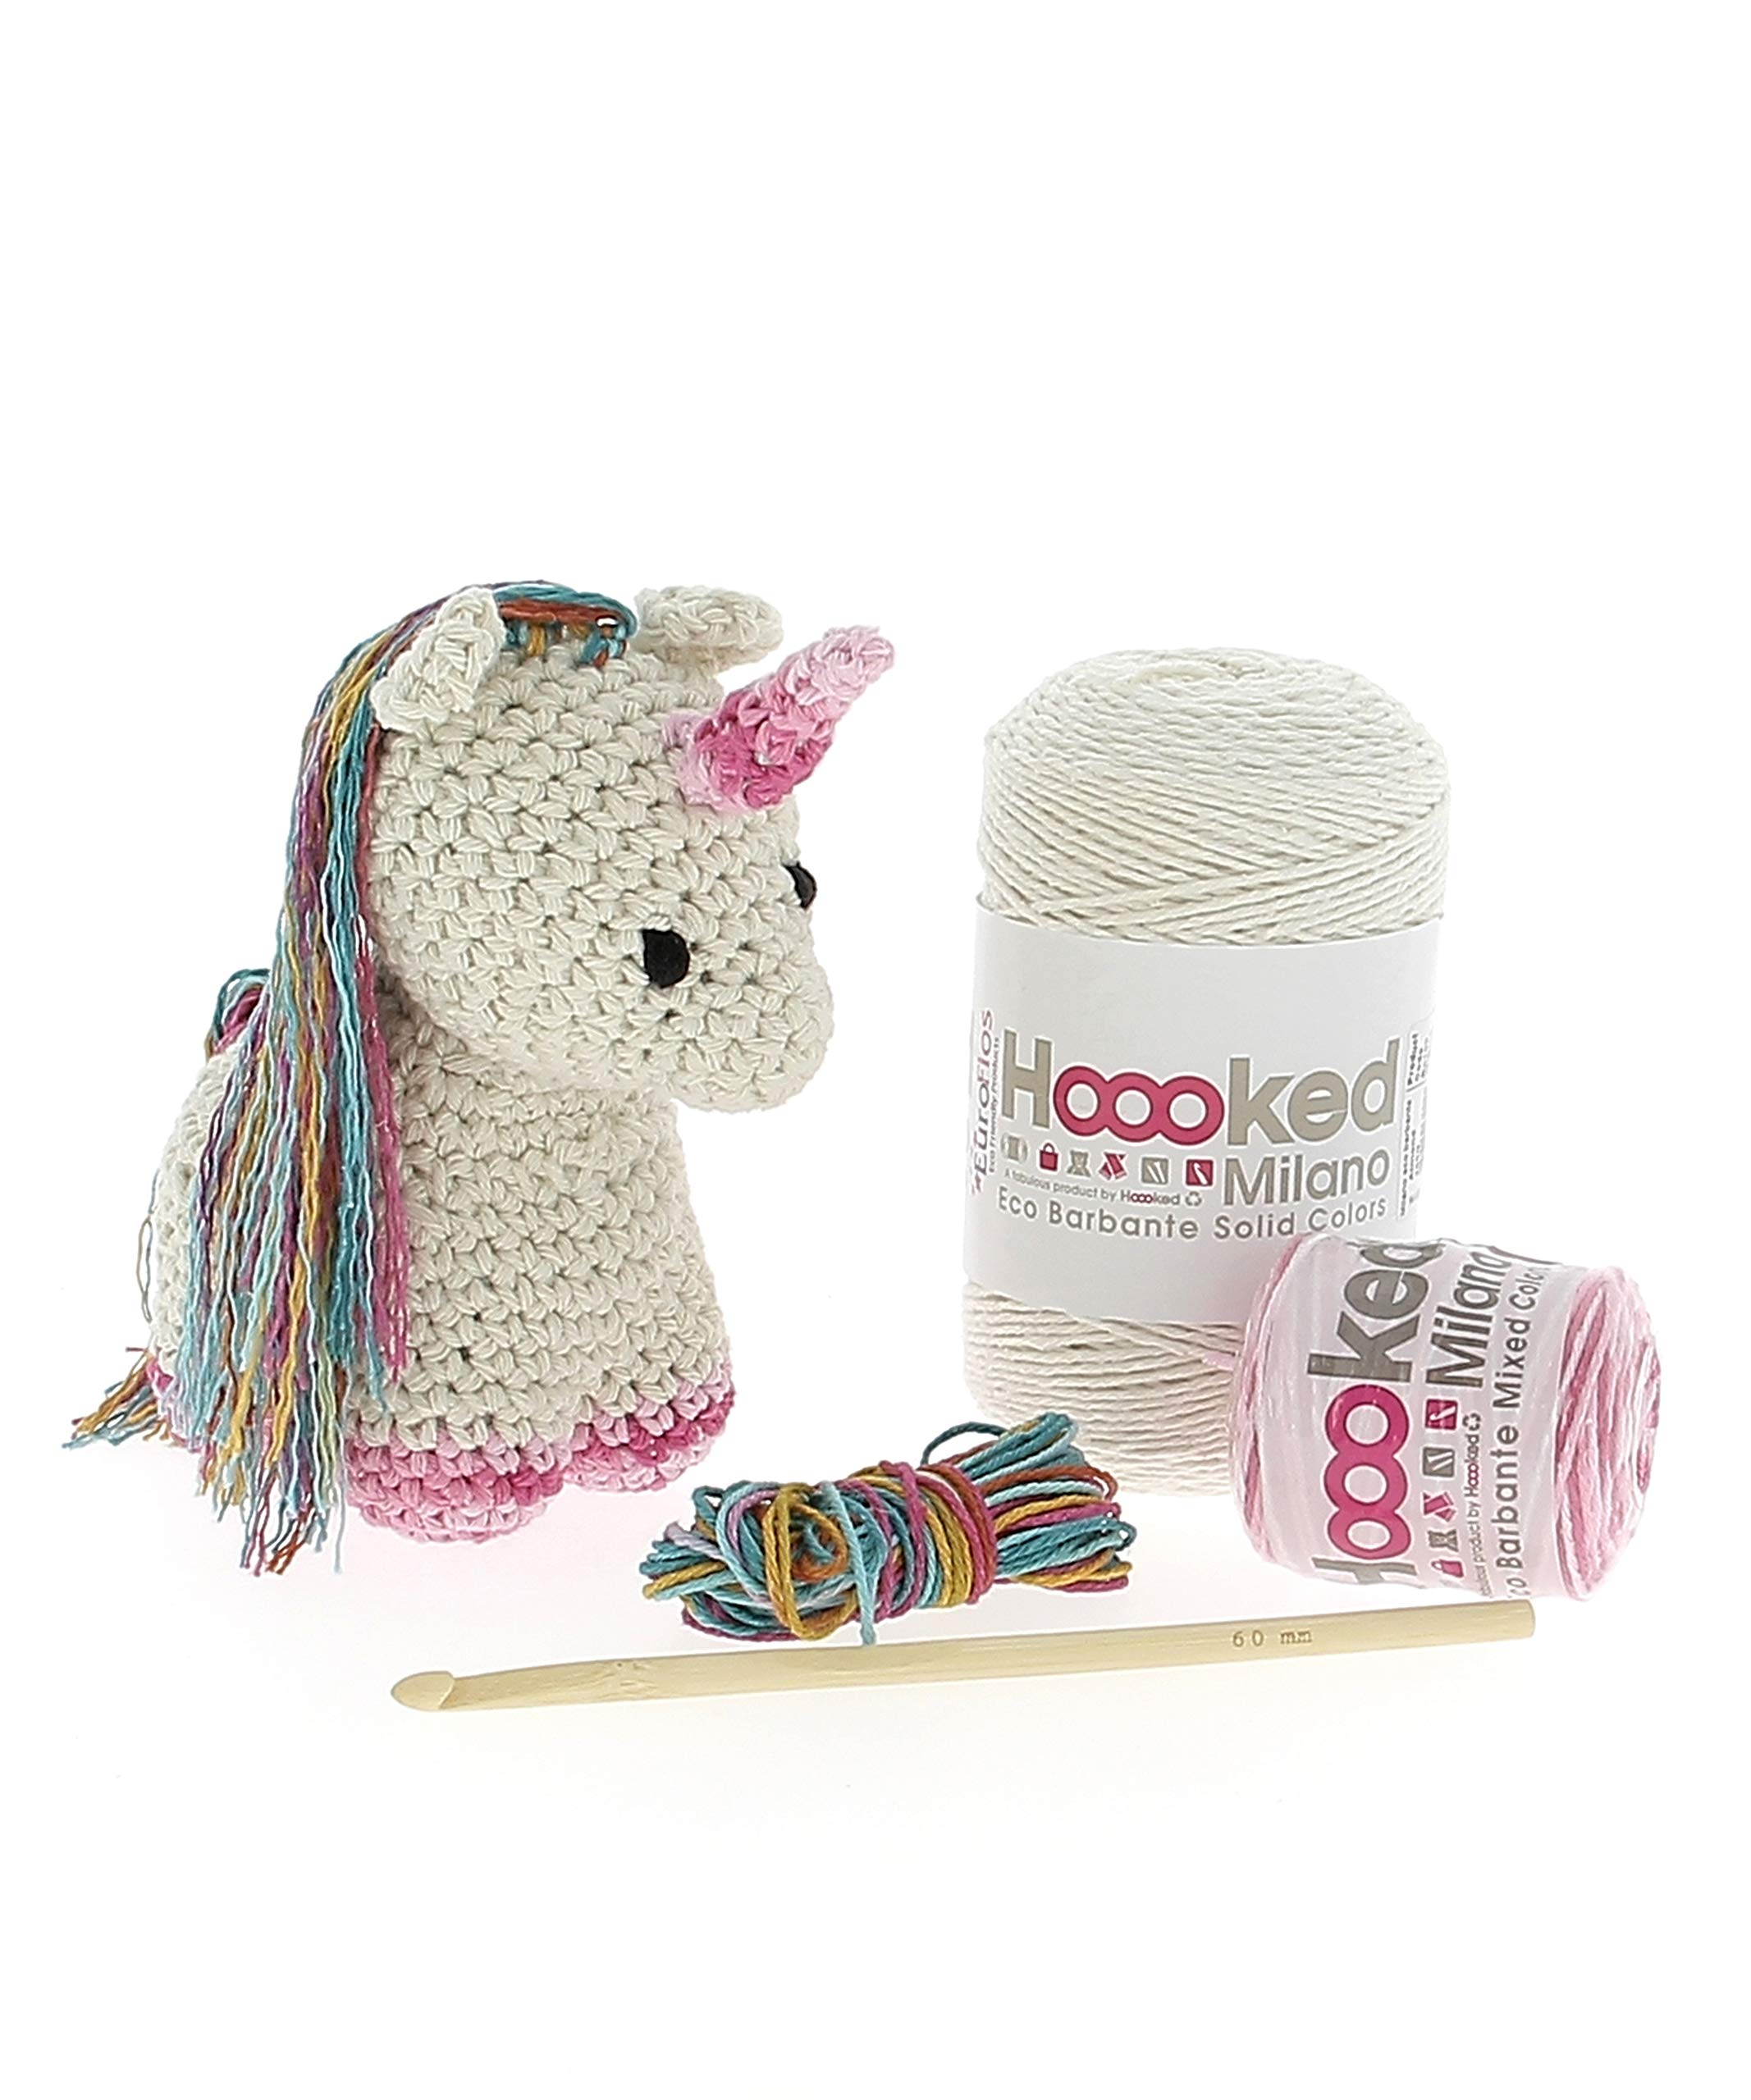 Hoooked Unicorn Yarn Crochet Kit Nora